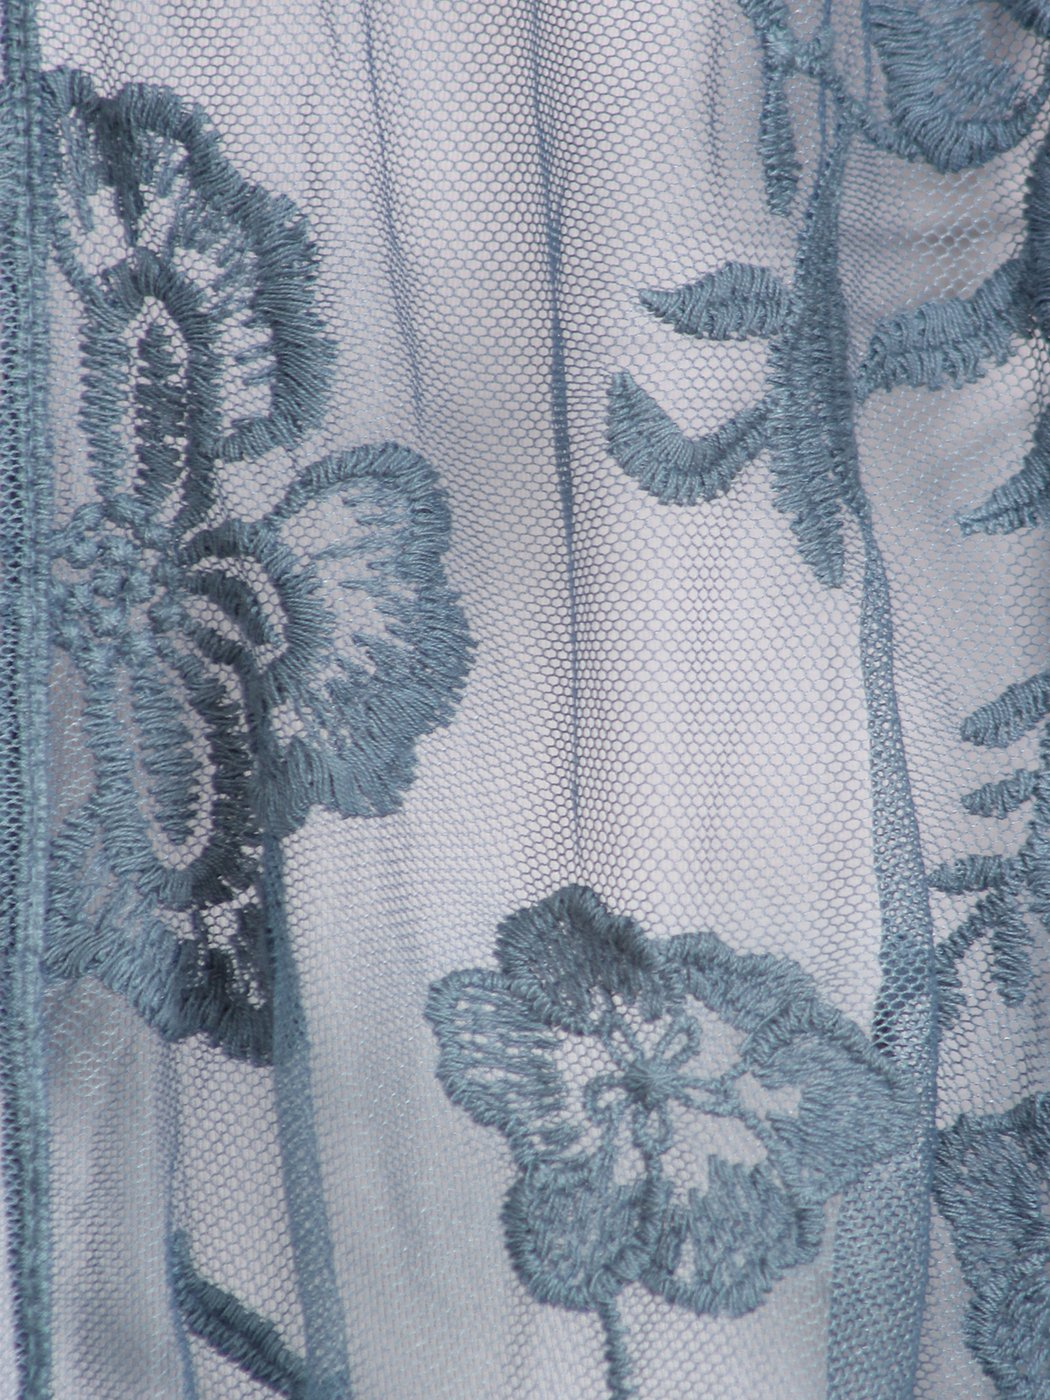 Anna-Kaci Womens Long Embroidered Lace Kimono Cardigan with Half Sleeves, Blue, OneSize by Anna-Kaci (Image #5)